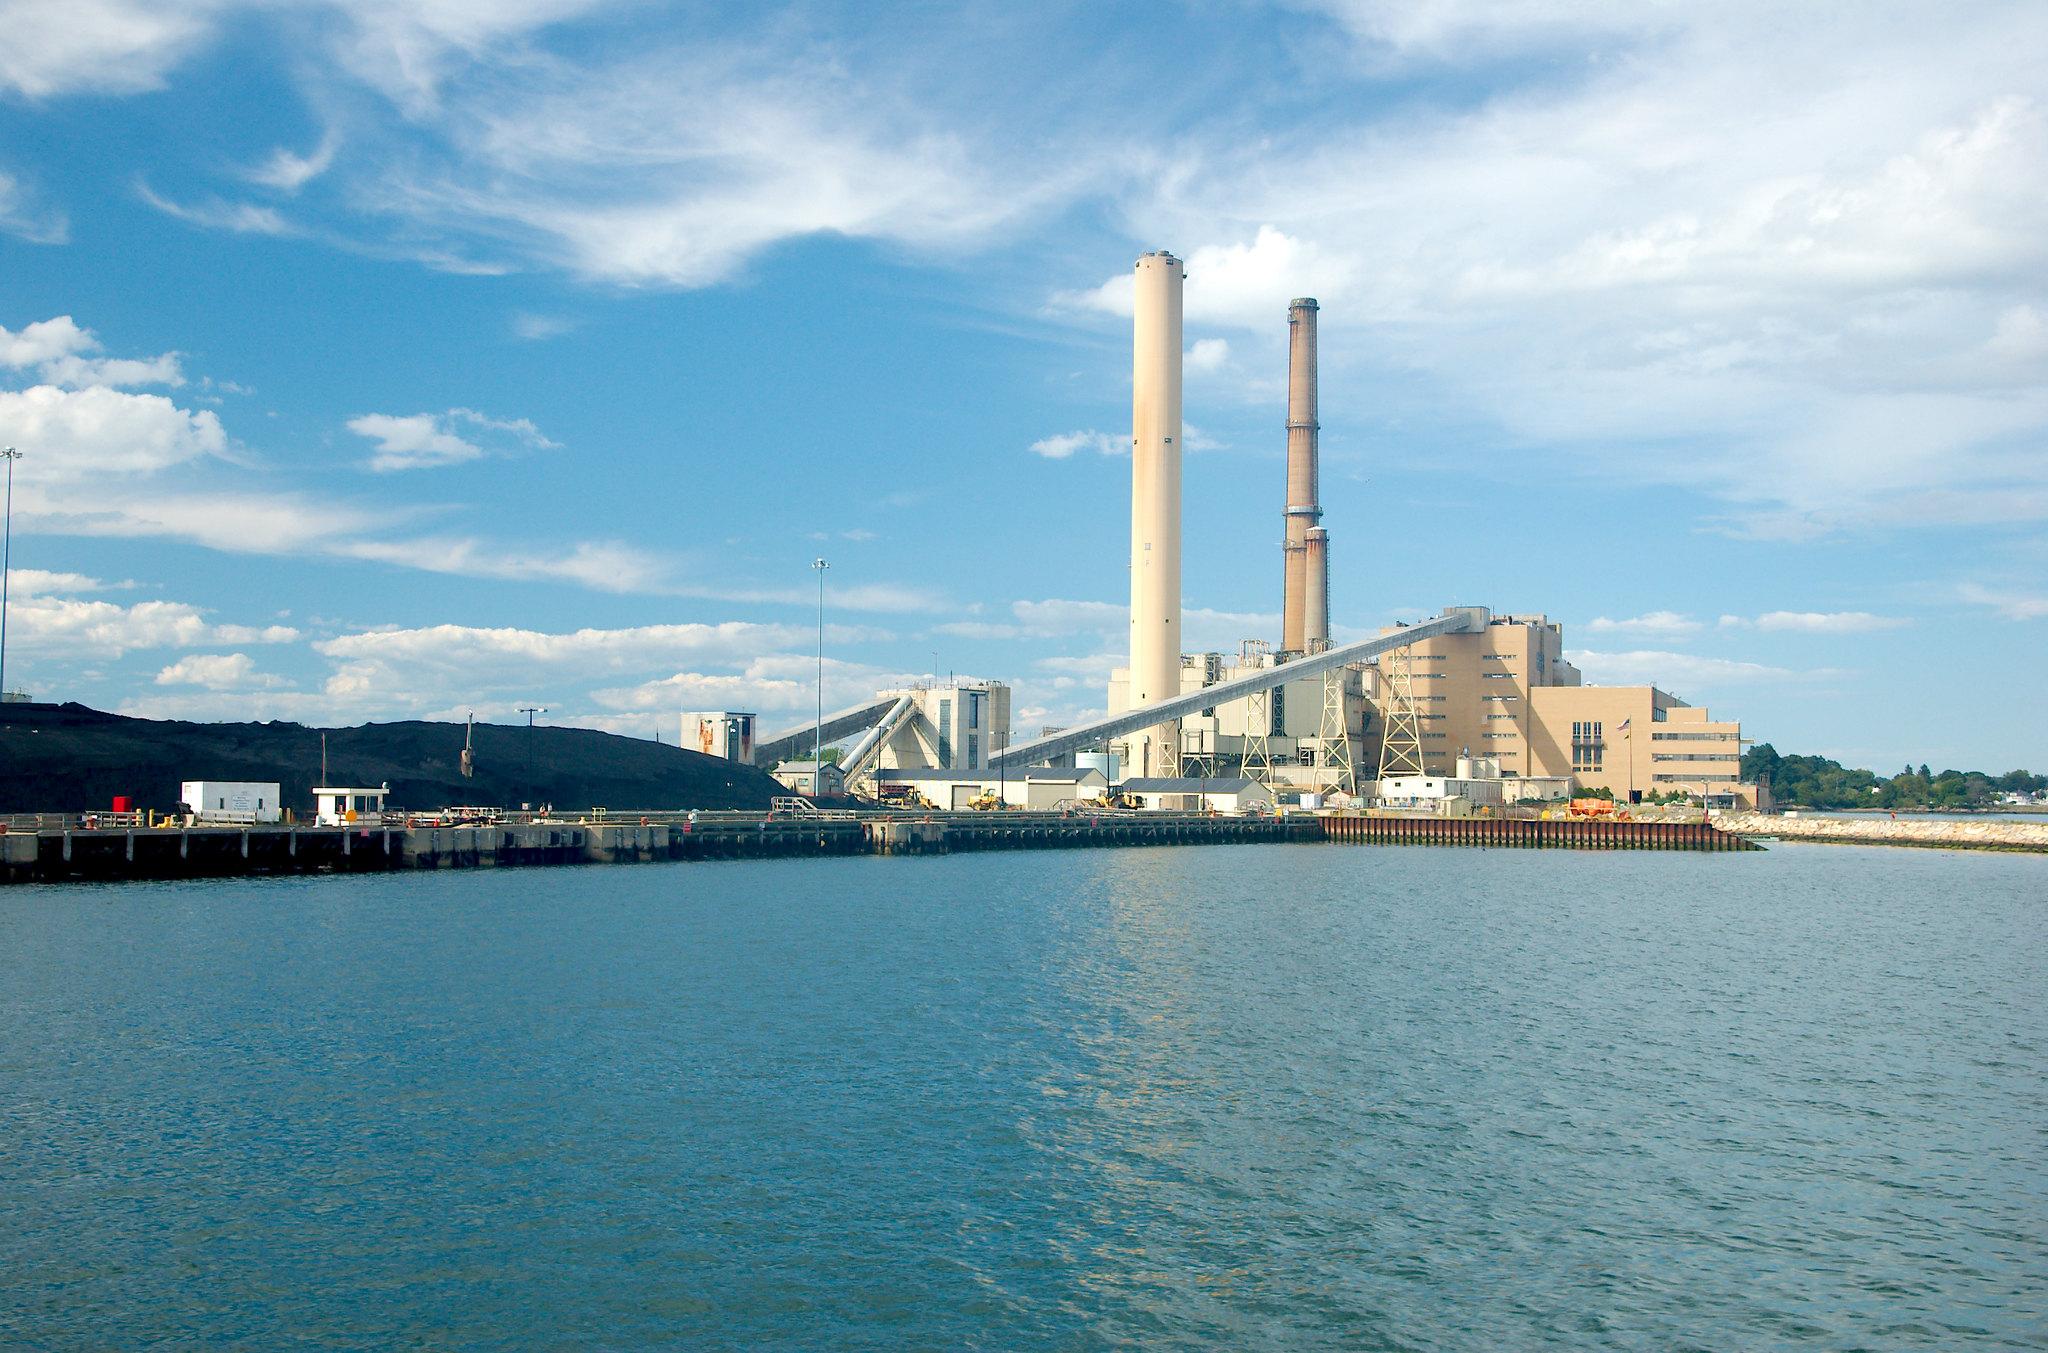 IEEFA: Solar-plus-storage undermines coal economics by 'hundreds of millions' of dollars